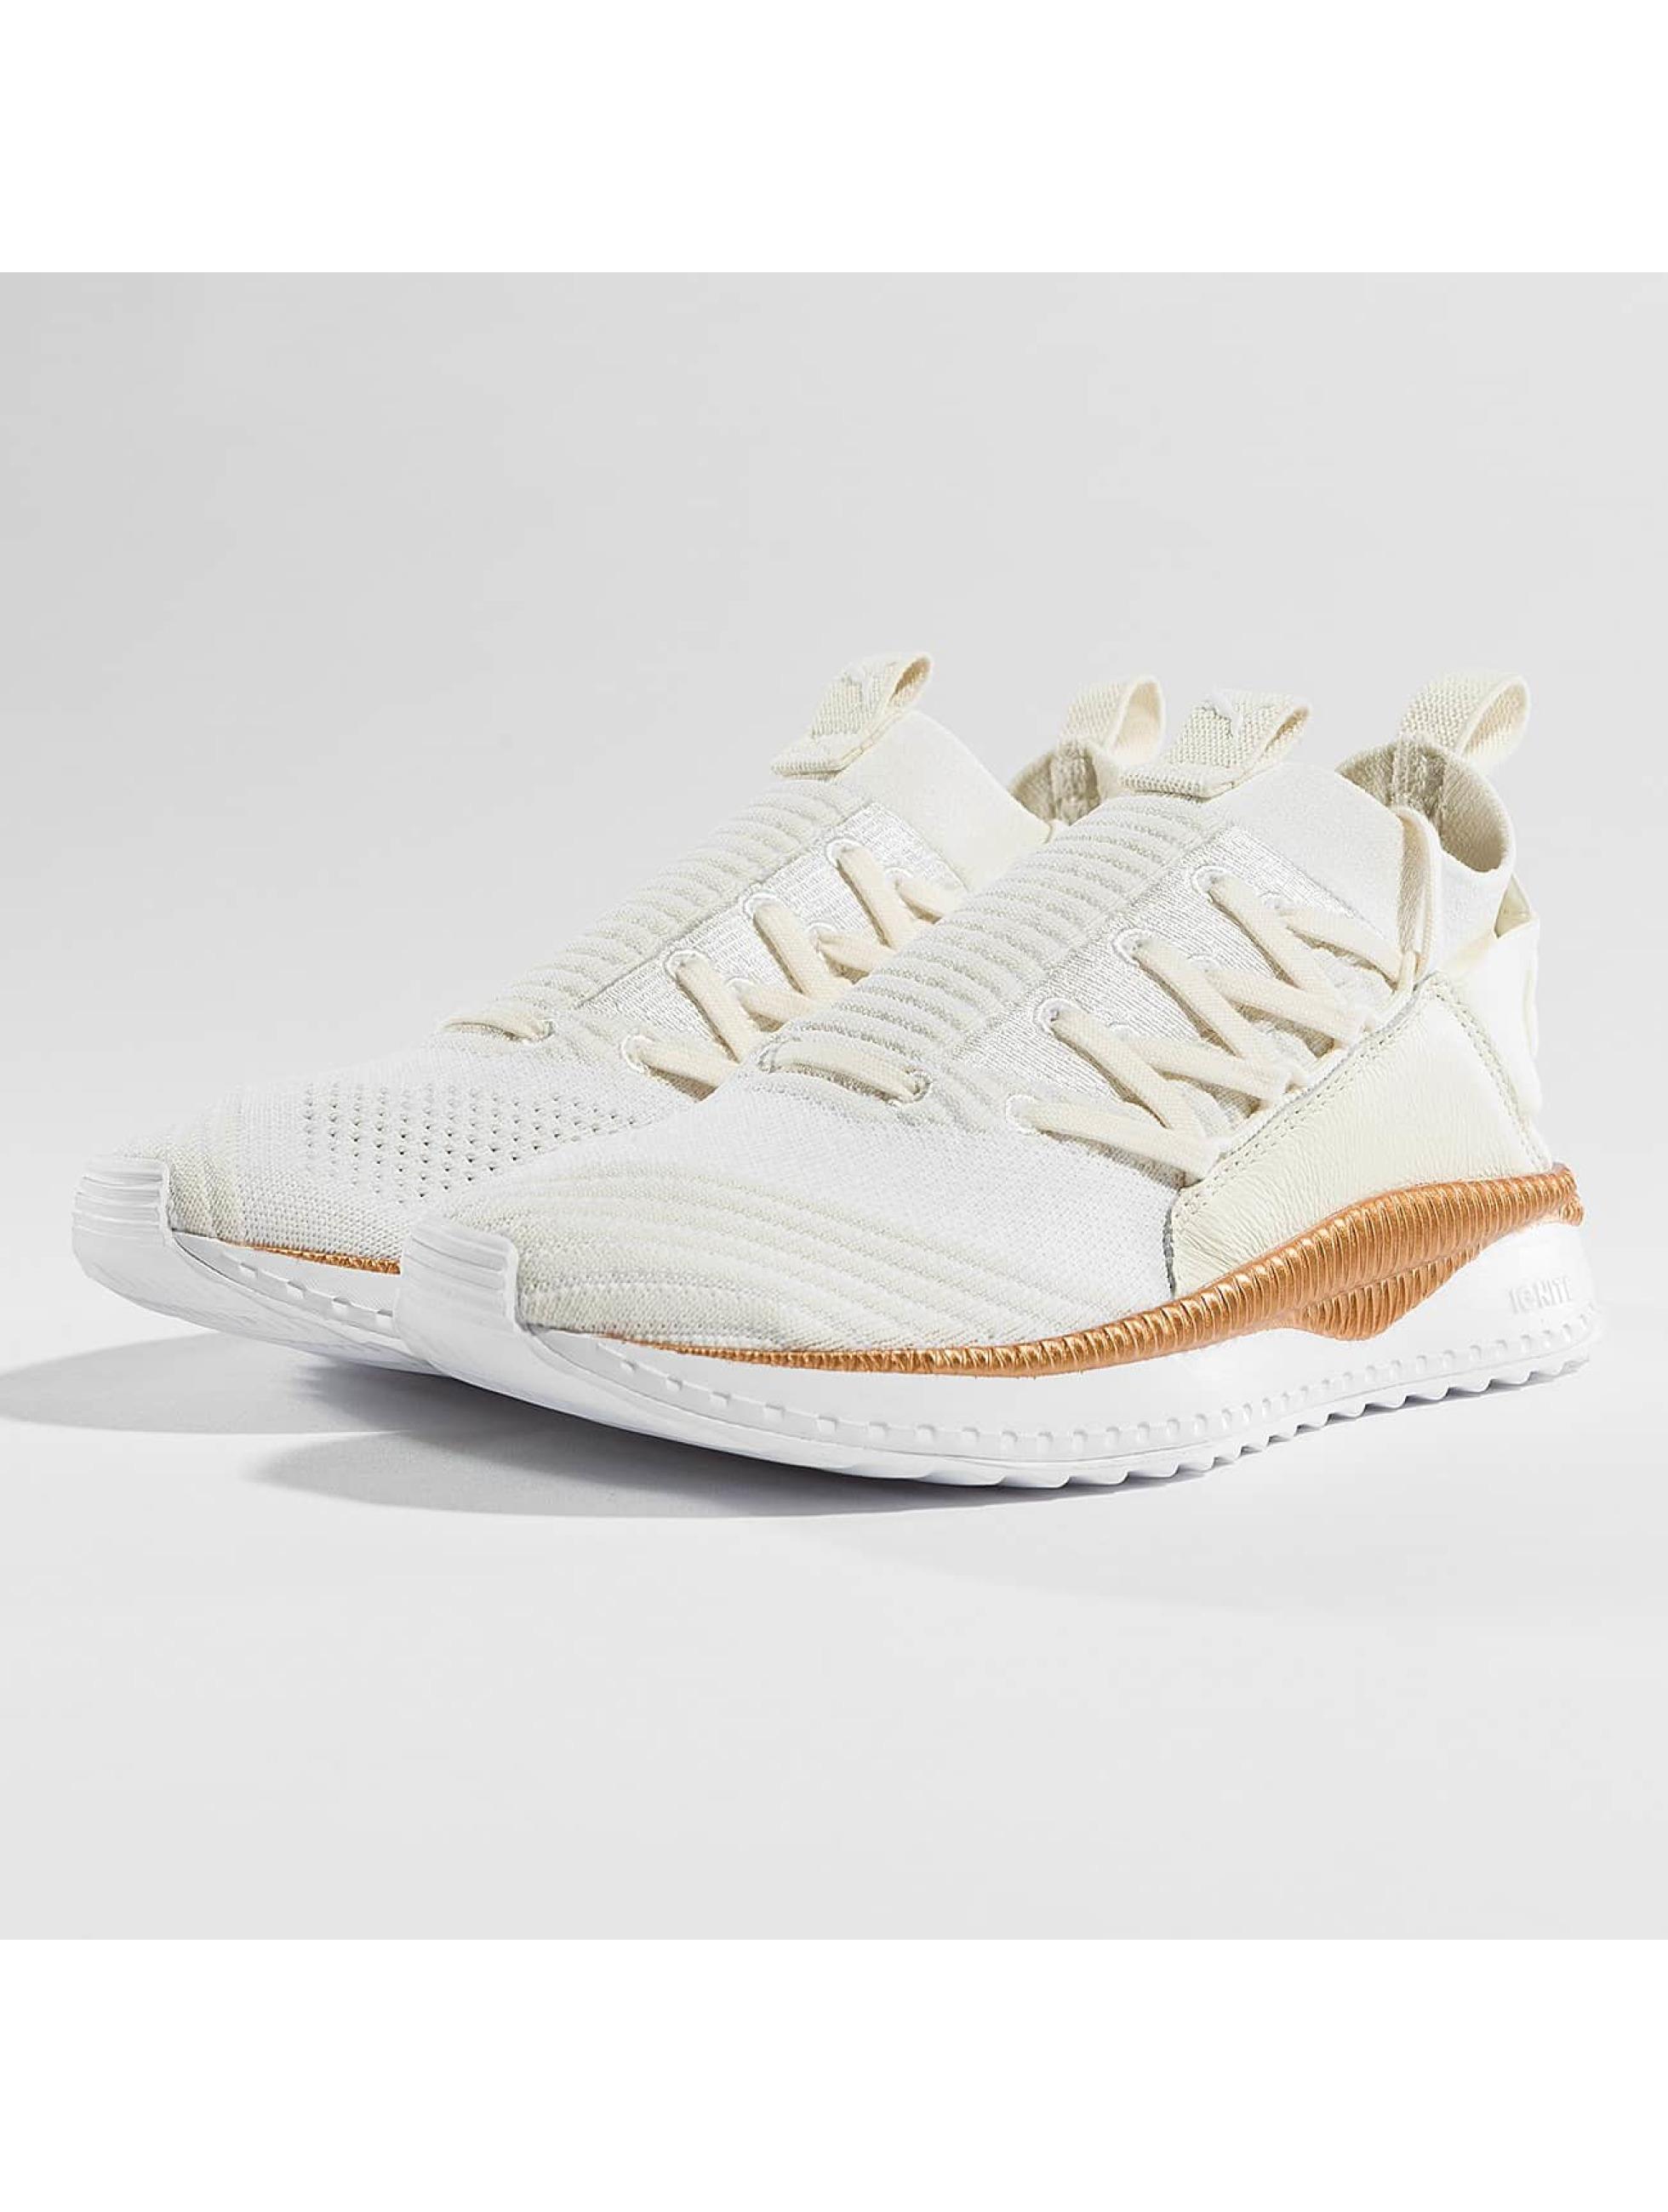 puma frauen sneaker weiß